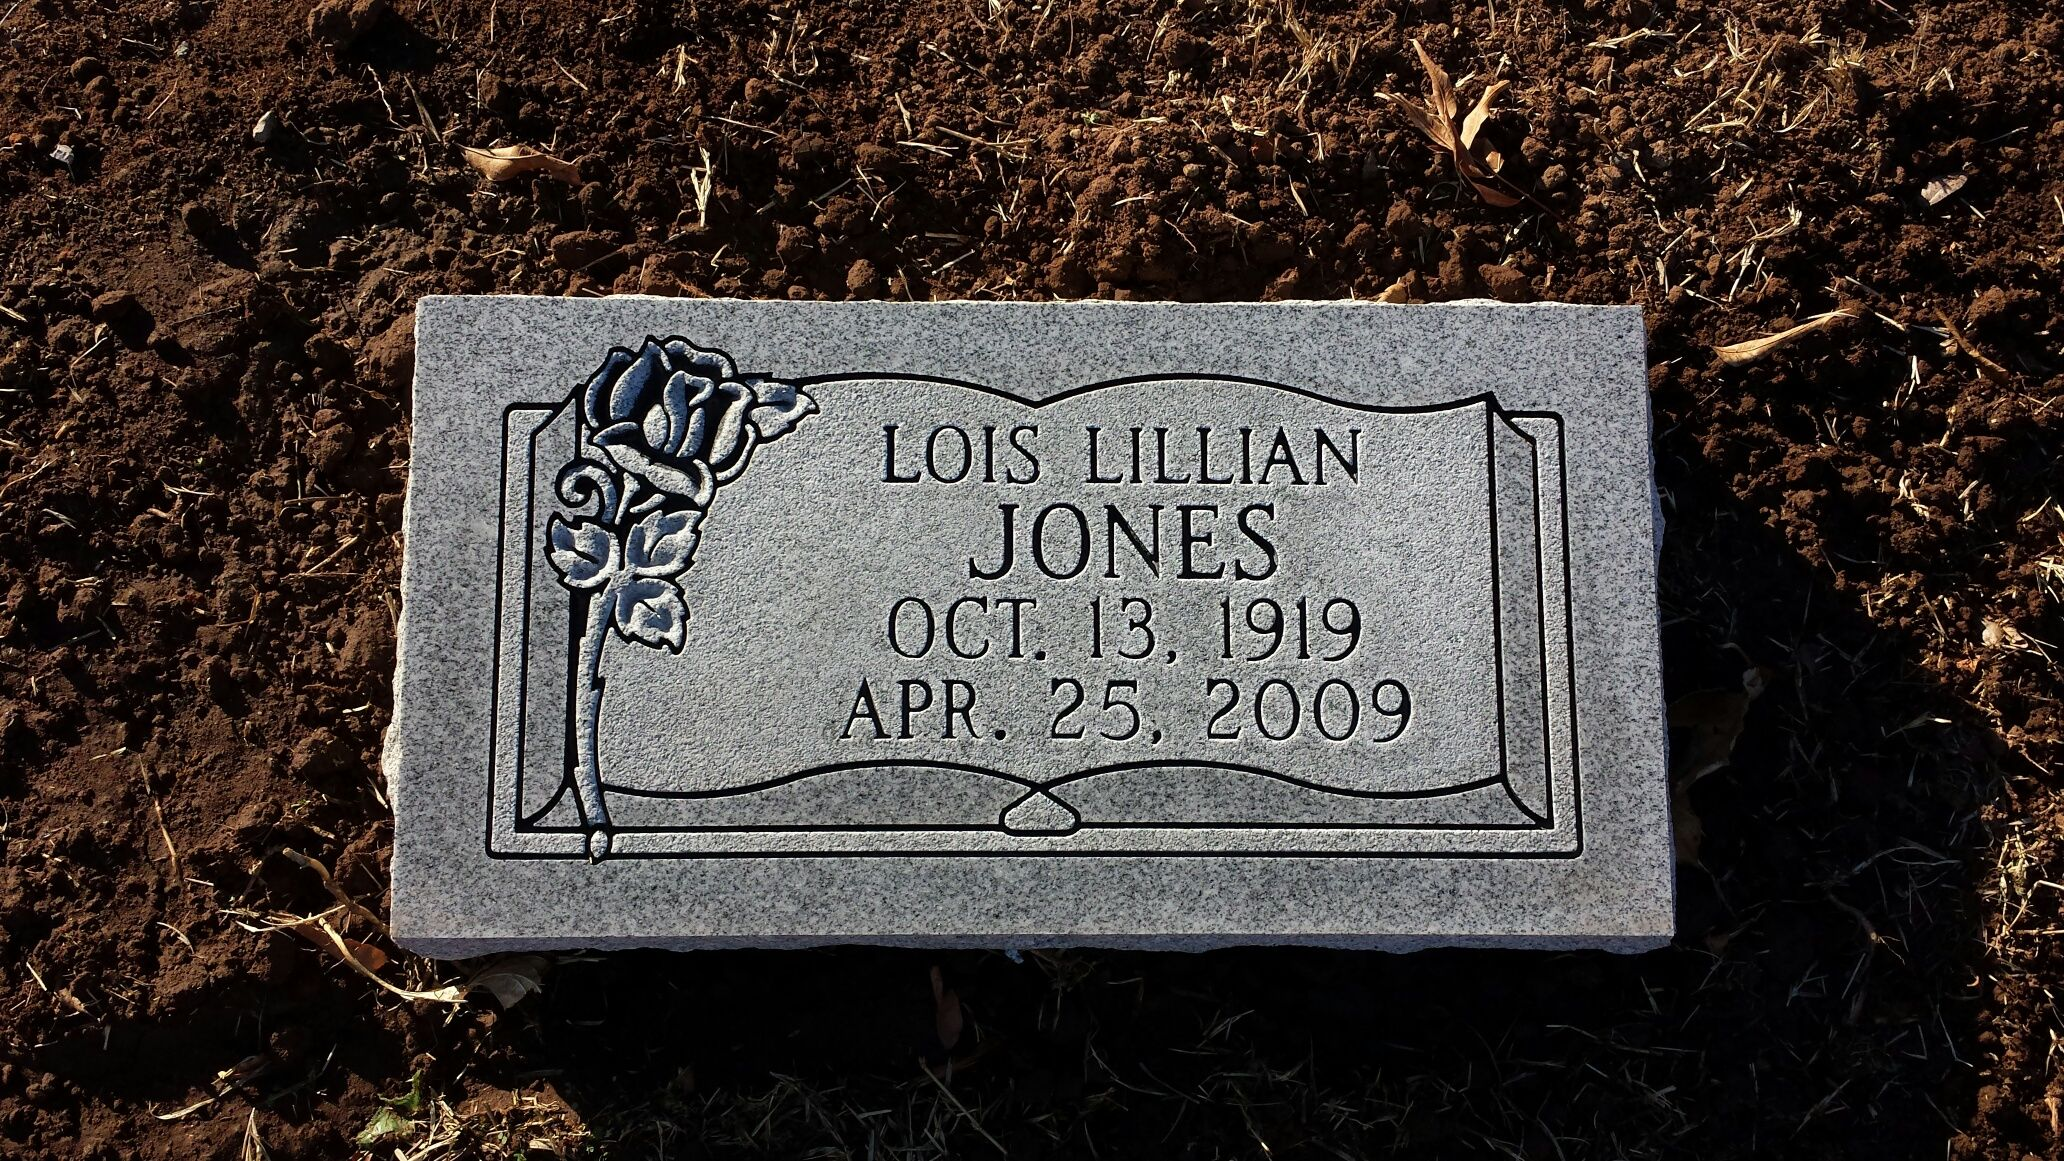 Jones, Lois